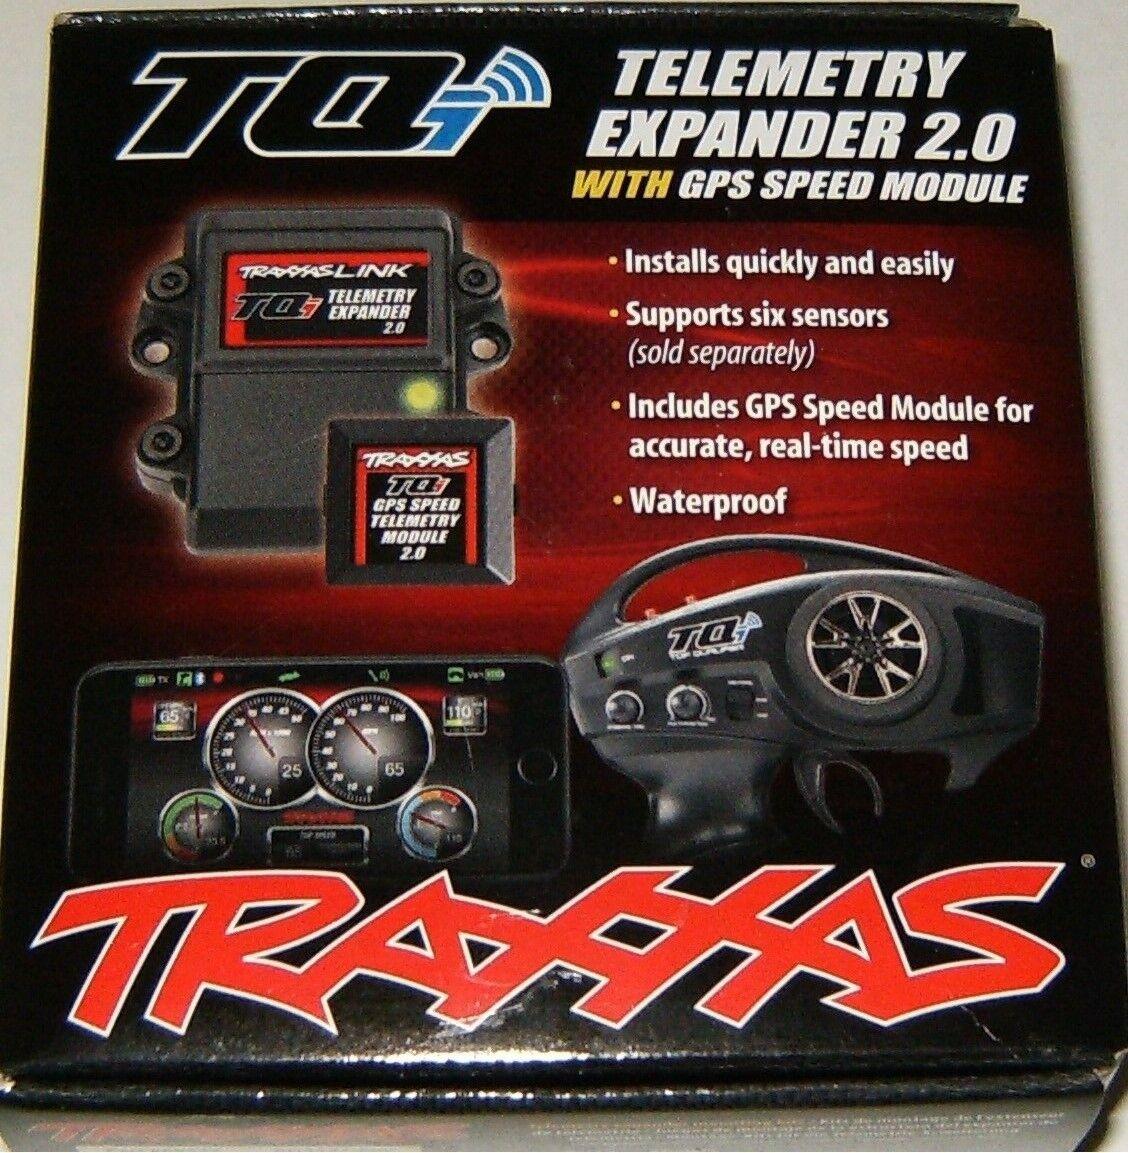 fino al 60% di sconto Traxxas TQi Telemetry Telemetry Telemetry Expeer 2.0 Waterproof With GPS Speed Module TRA6553X  risposte rapide